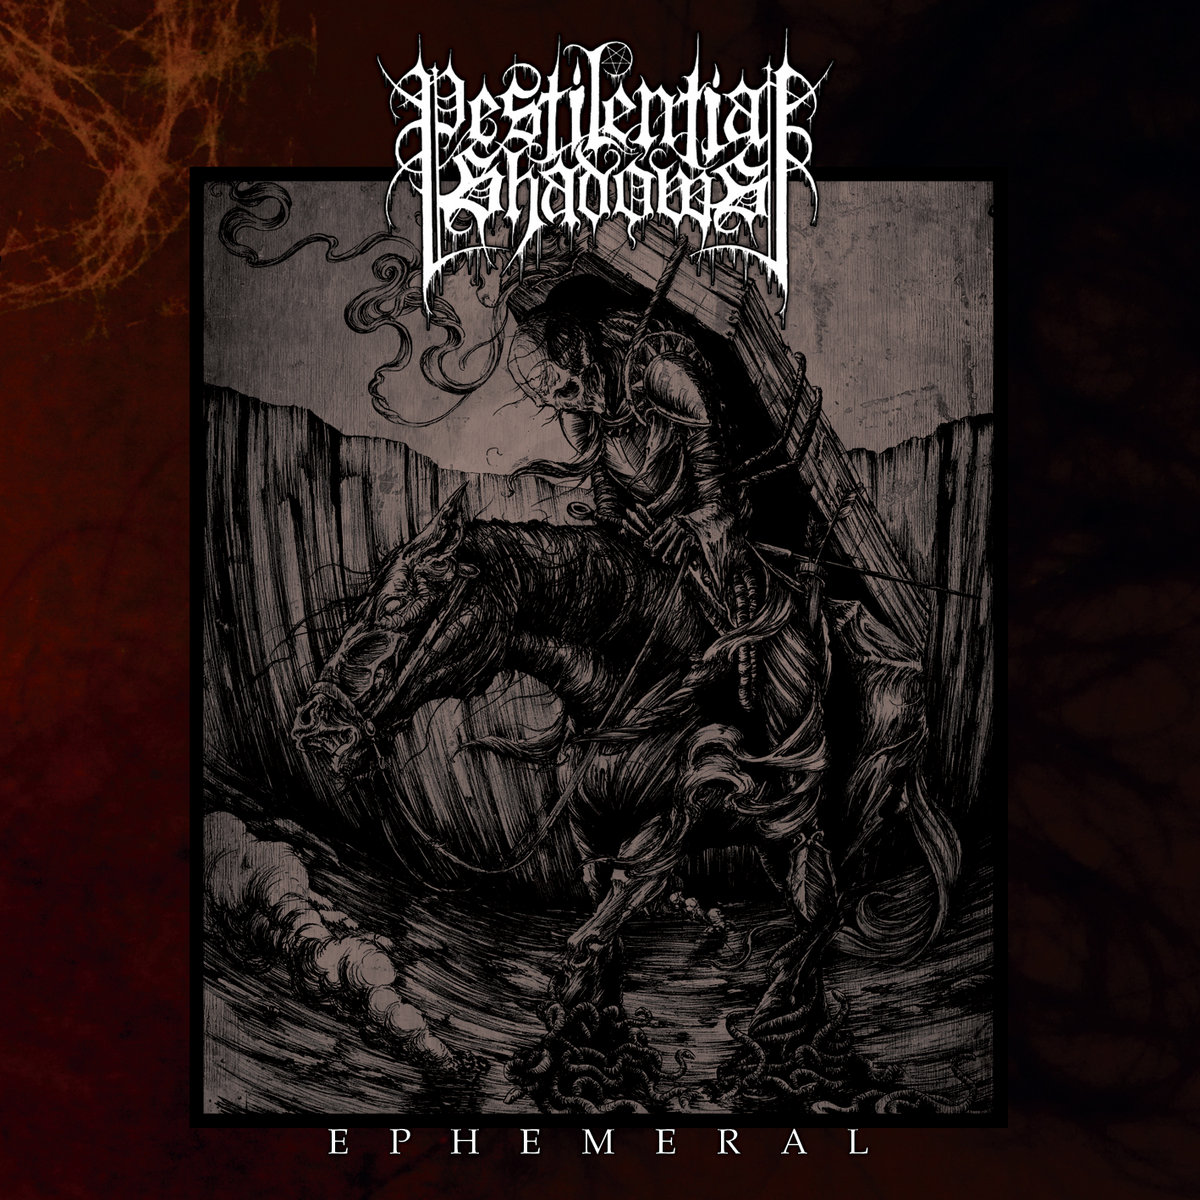 Pestilential Shadows - Ephemeral (2014)